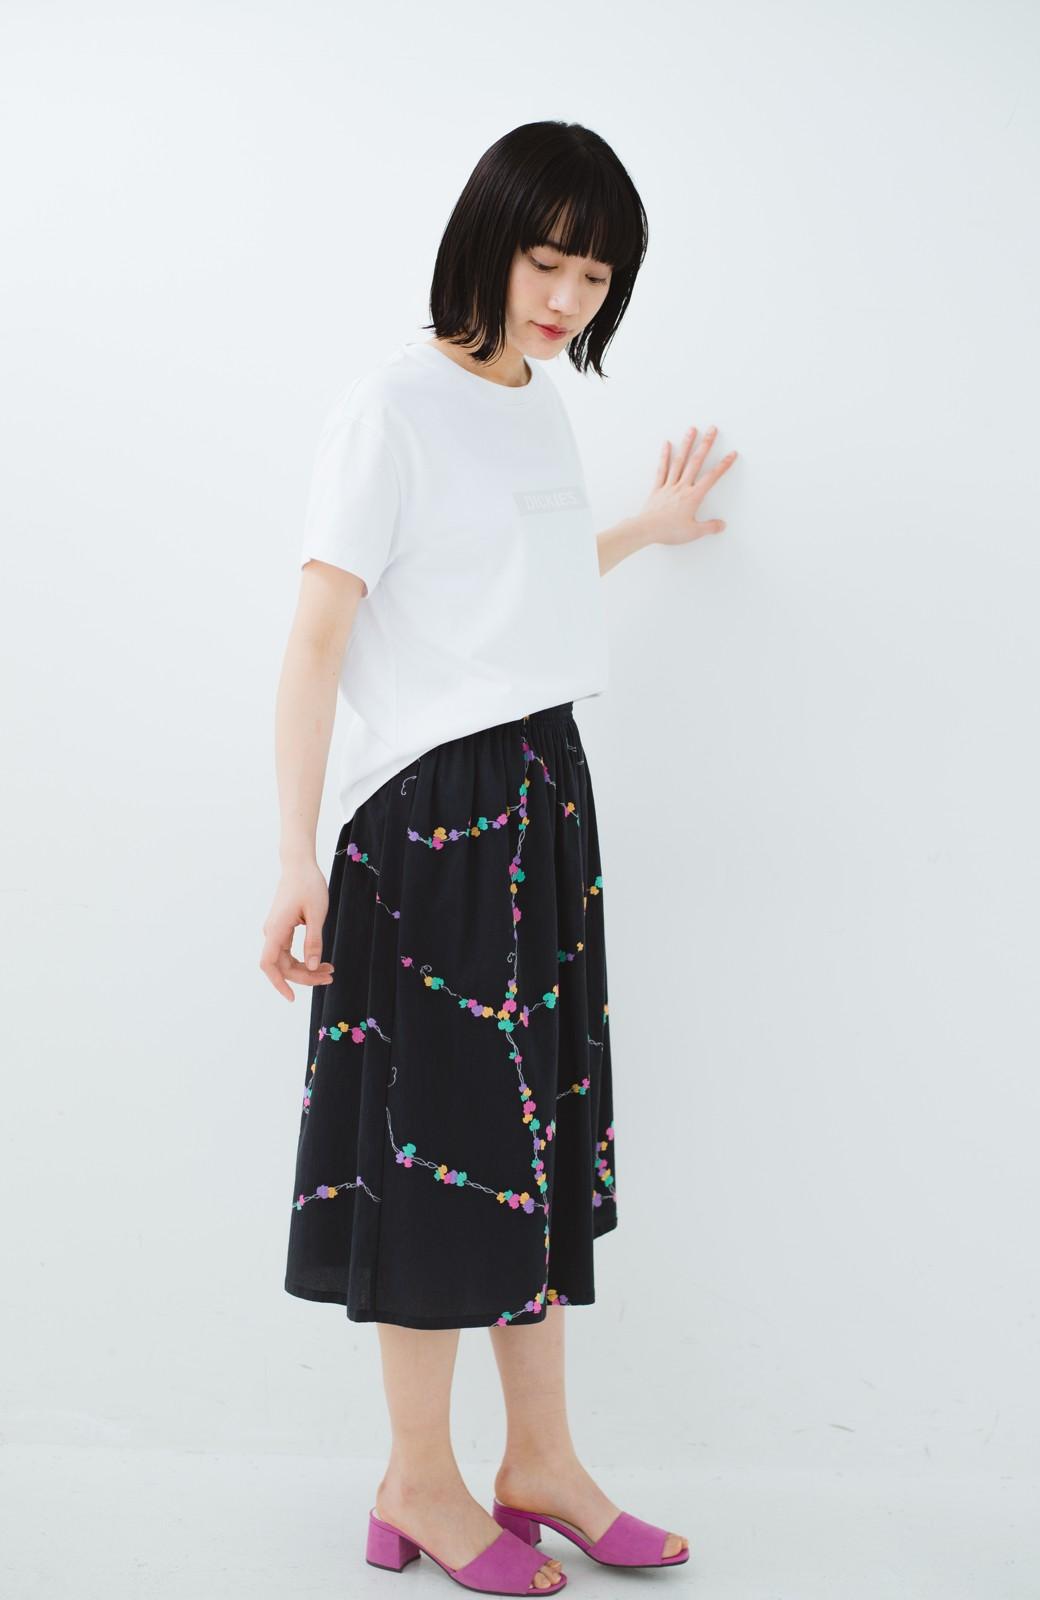 haco! 京都の浴衣屋さんと作った浴衣生地のスカート <ブラック系その他>の商品写真13